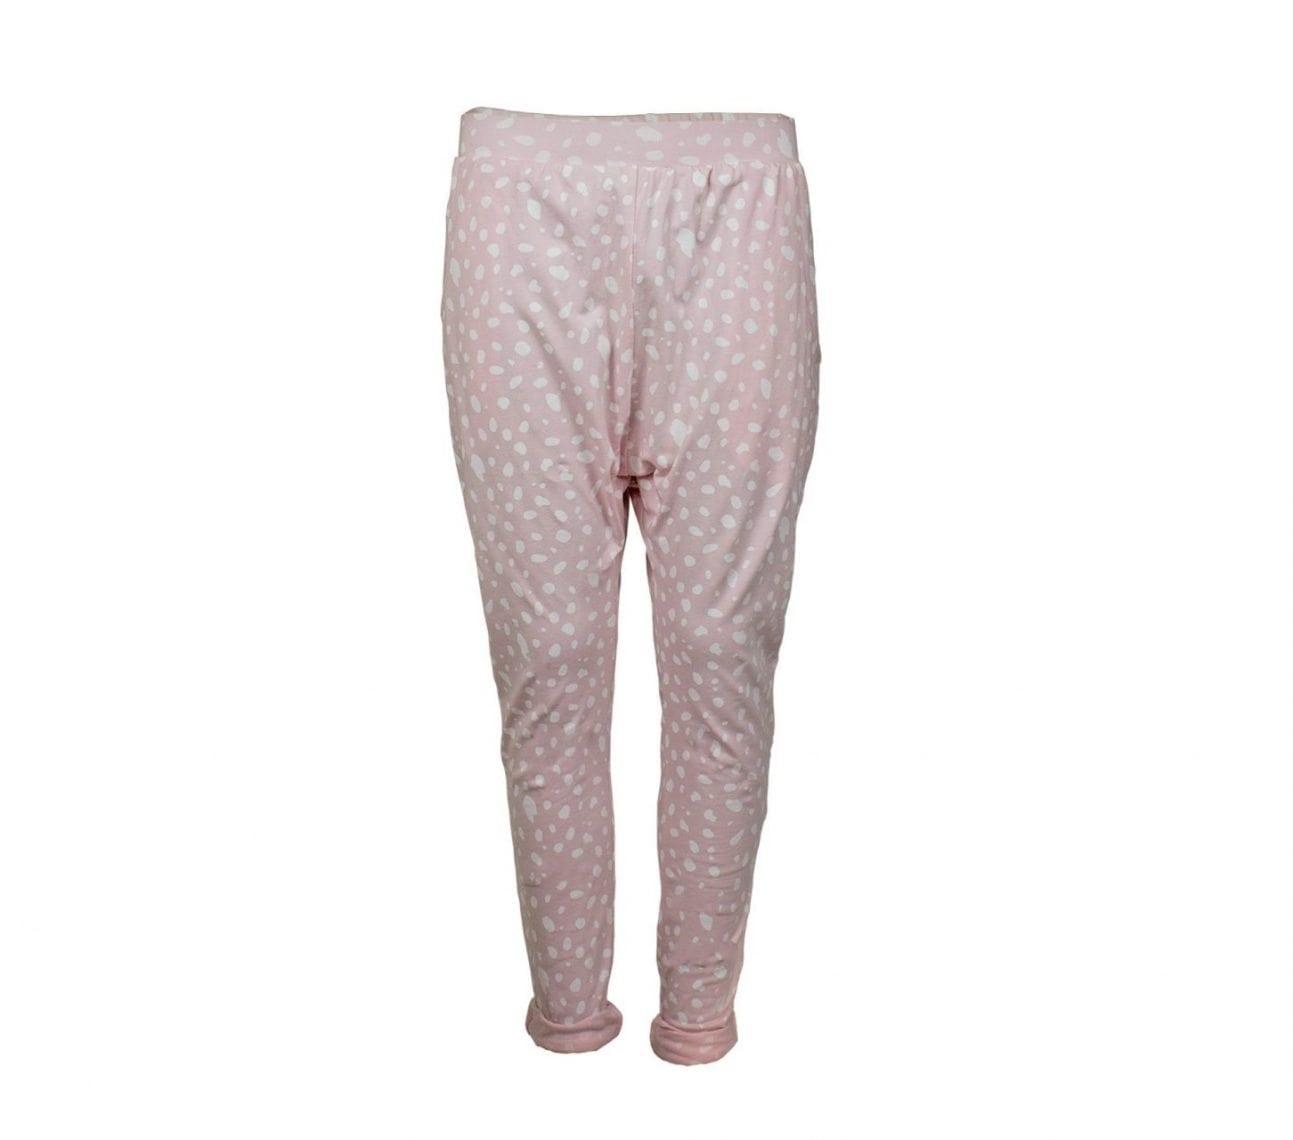 Haremsbyxa barn rosa/vit dalmatin – Memphis